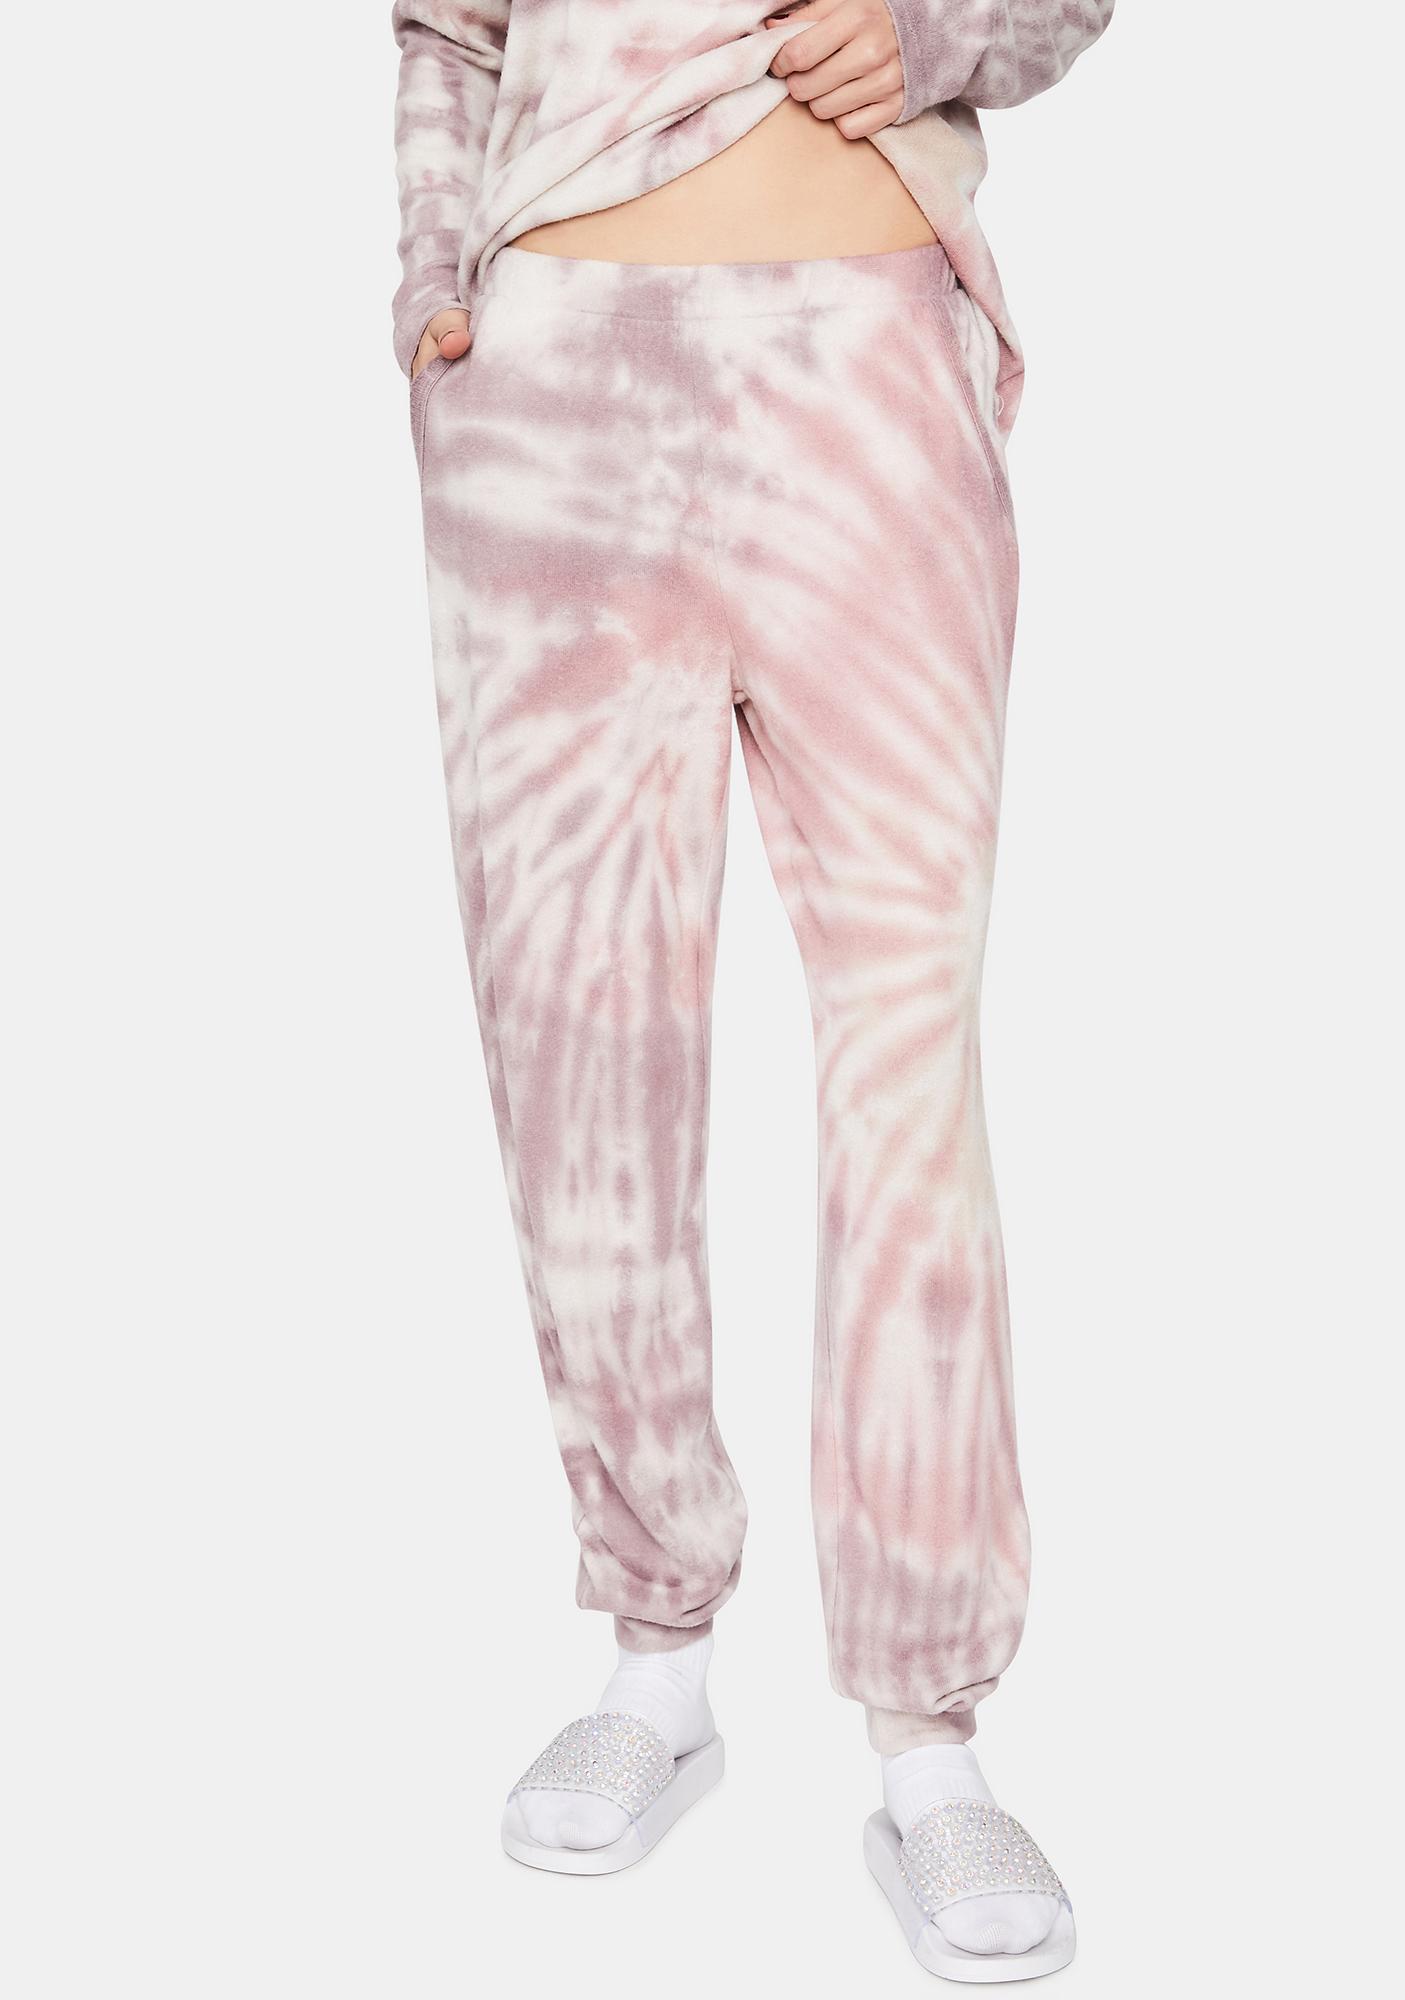 Violet Coast Cruisin' Tie Dye Joggers